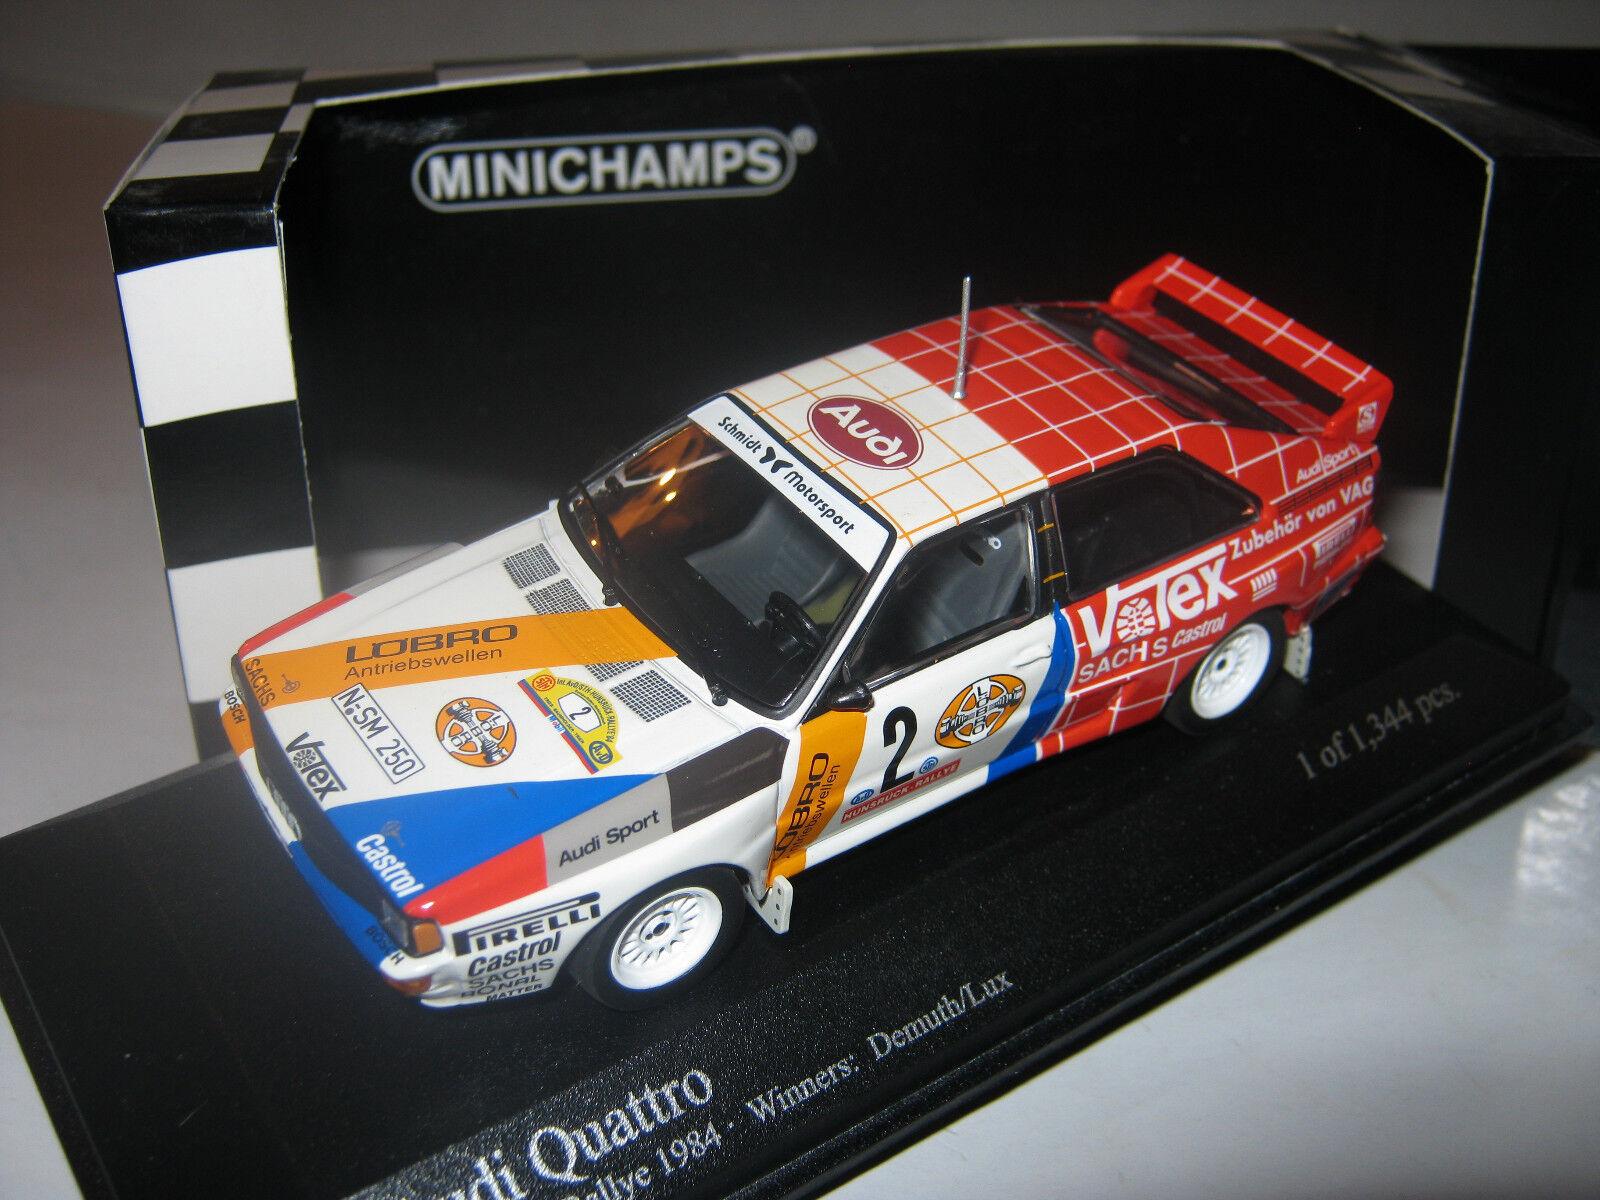 1 43 43 43 Audi Quattro Rallye 1984 Demuth Lux Minichamps 430841991 OVP new 1 of 1344 589879